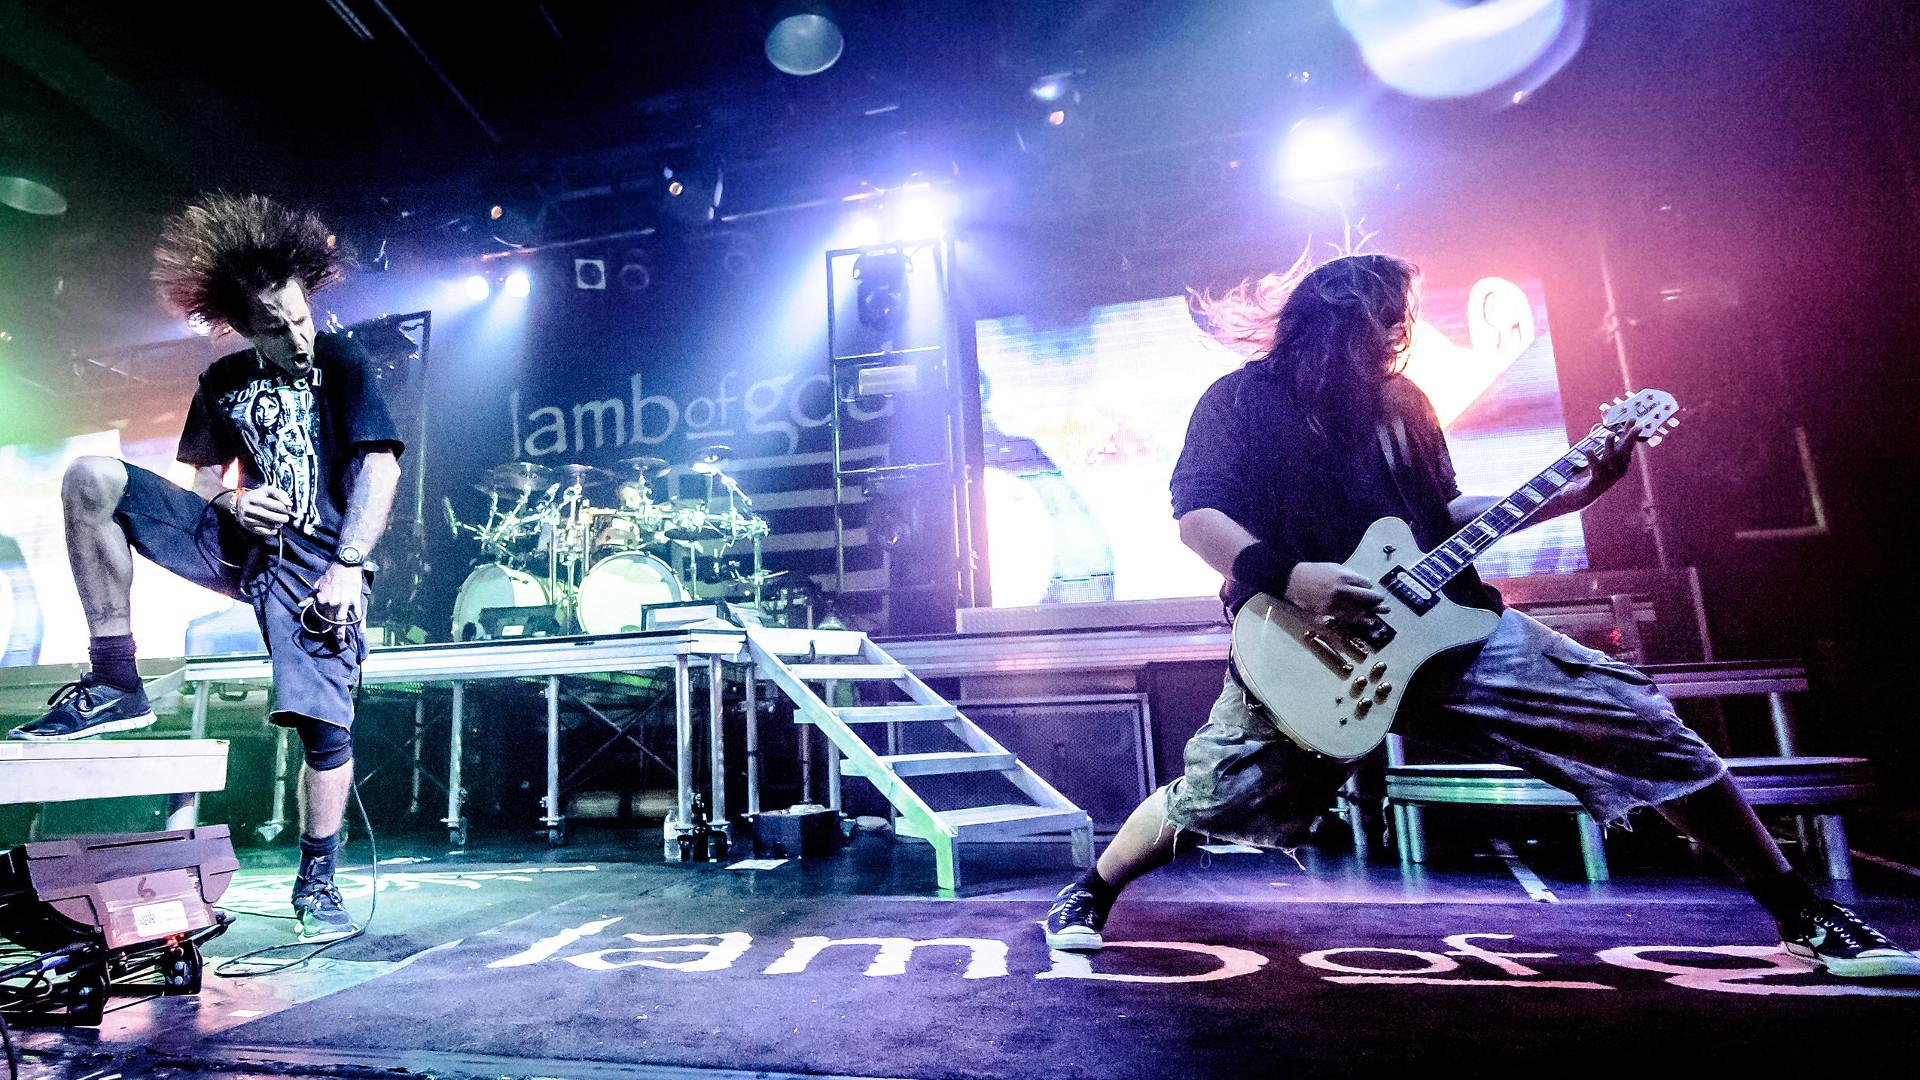 Lamb of God | Music fanart | fanart.tv for Lamb Of God Live At Download  111bof